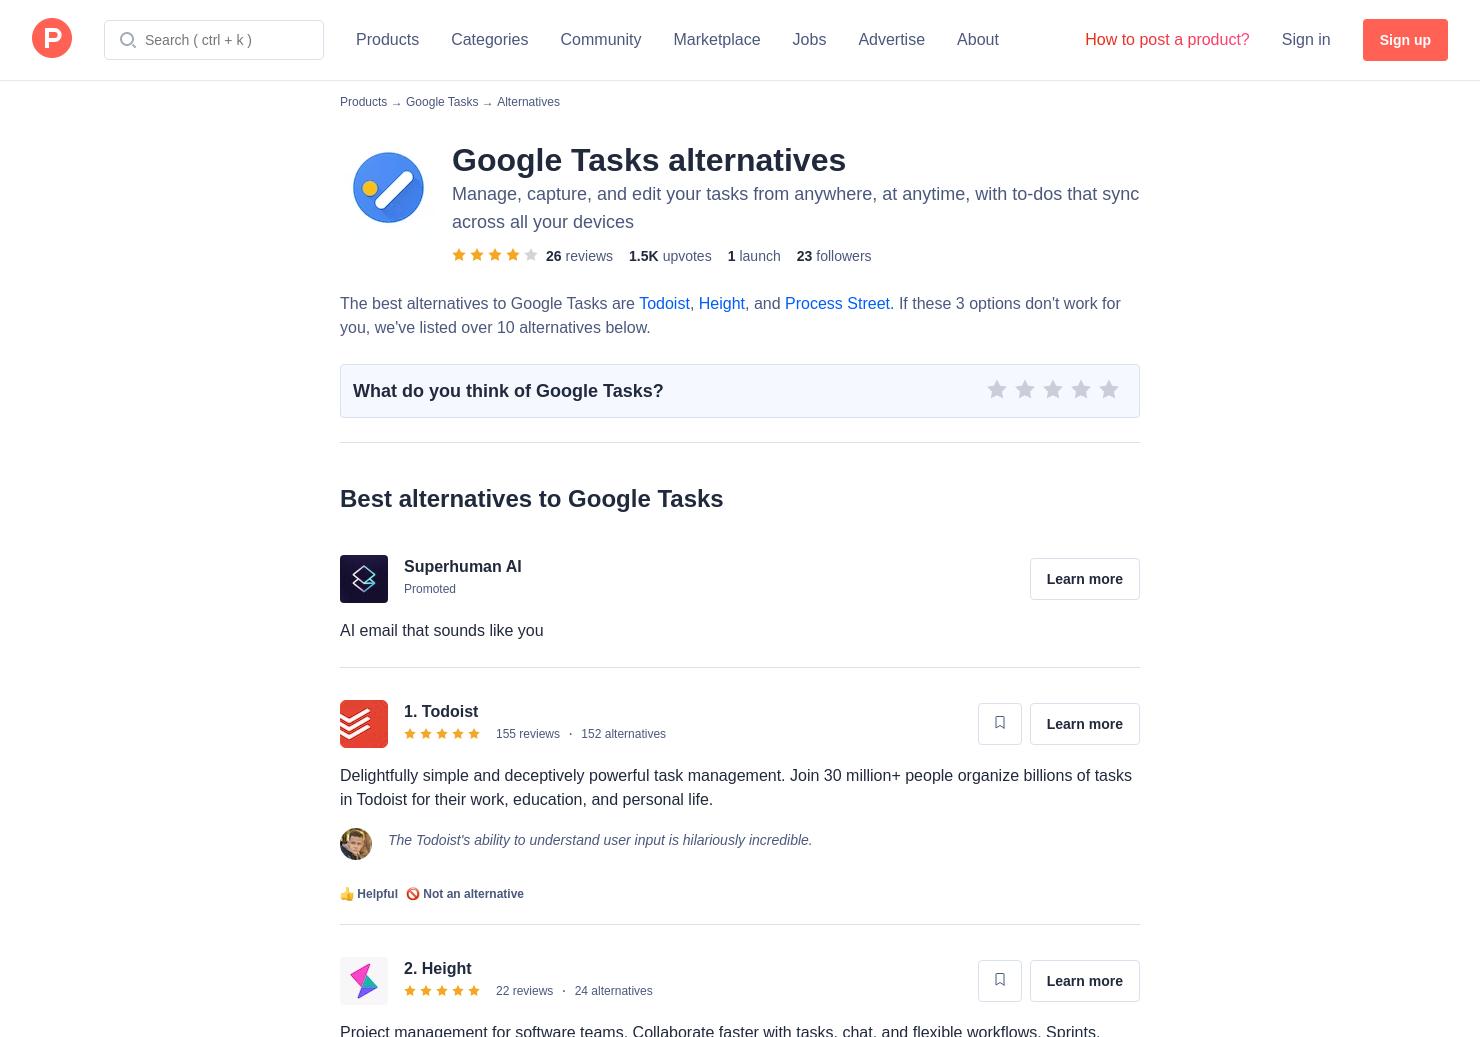 13 Alternatives to Google Tasks for Mobile for Android